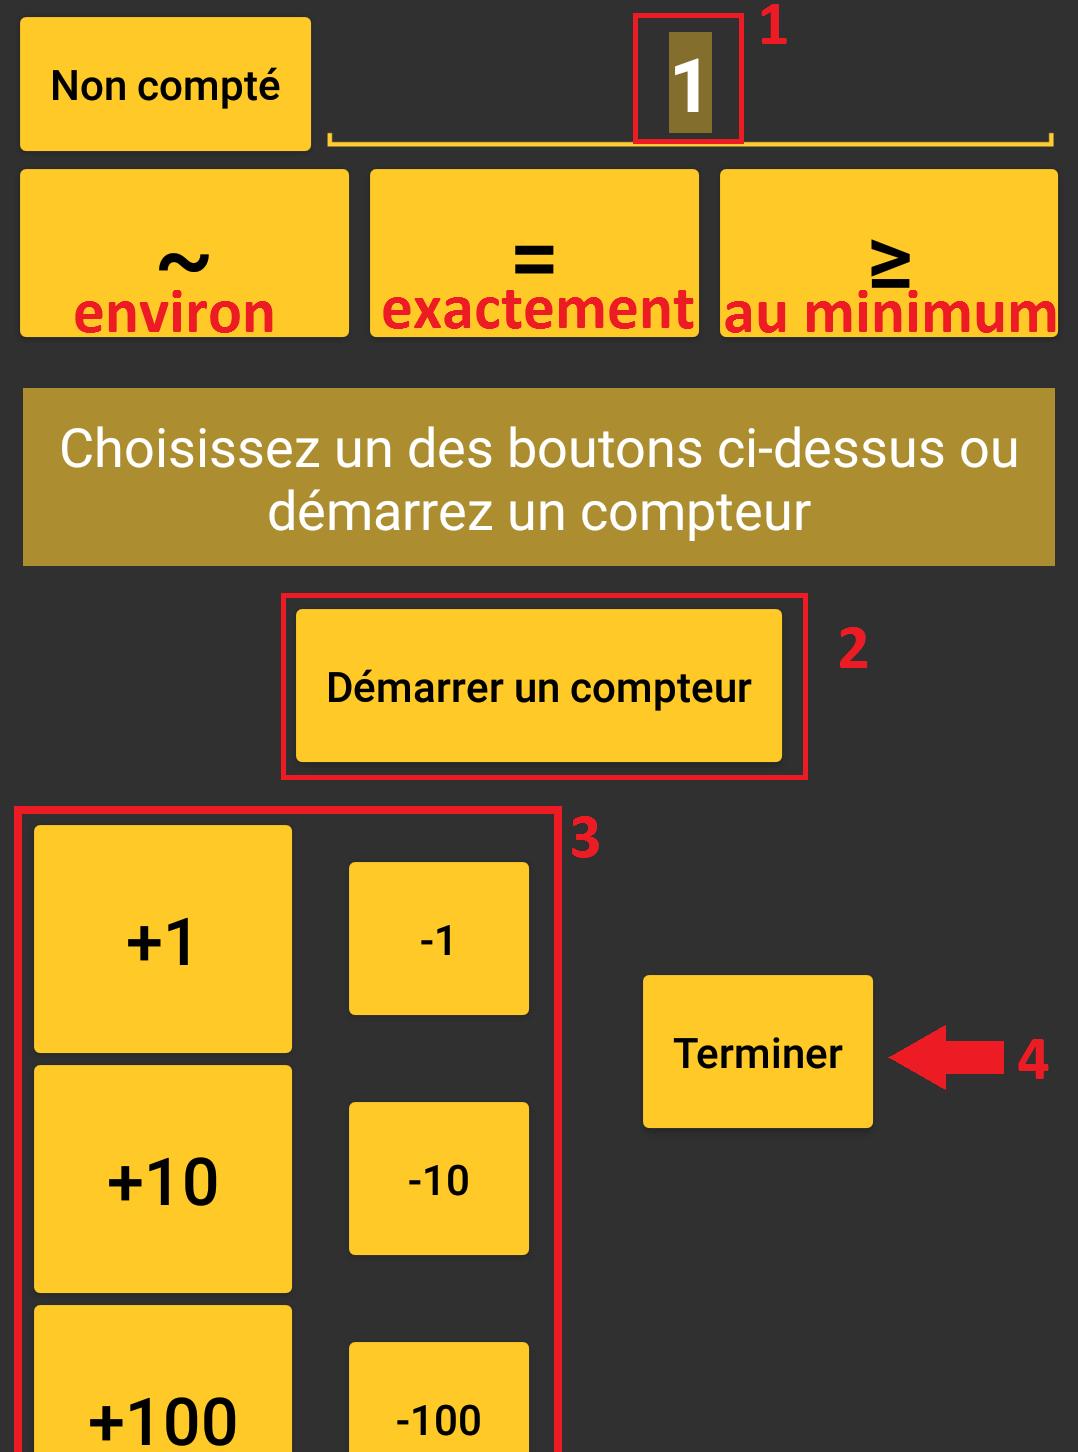 https://cdnfiles1.biolovision.net/www.faune-france.org/userfiles/ListeNaturaList/5-effectif-compteur.png